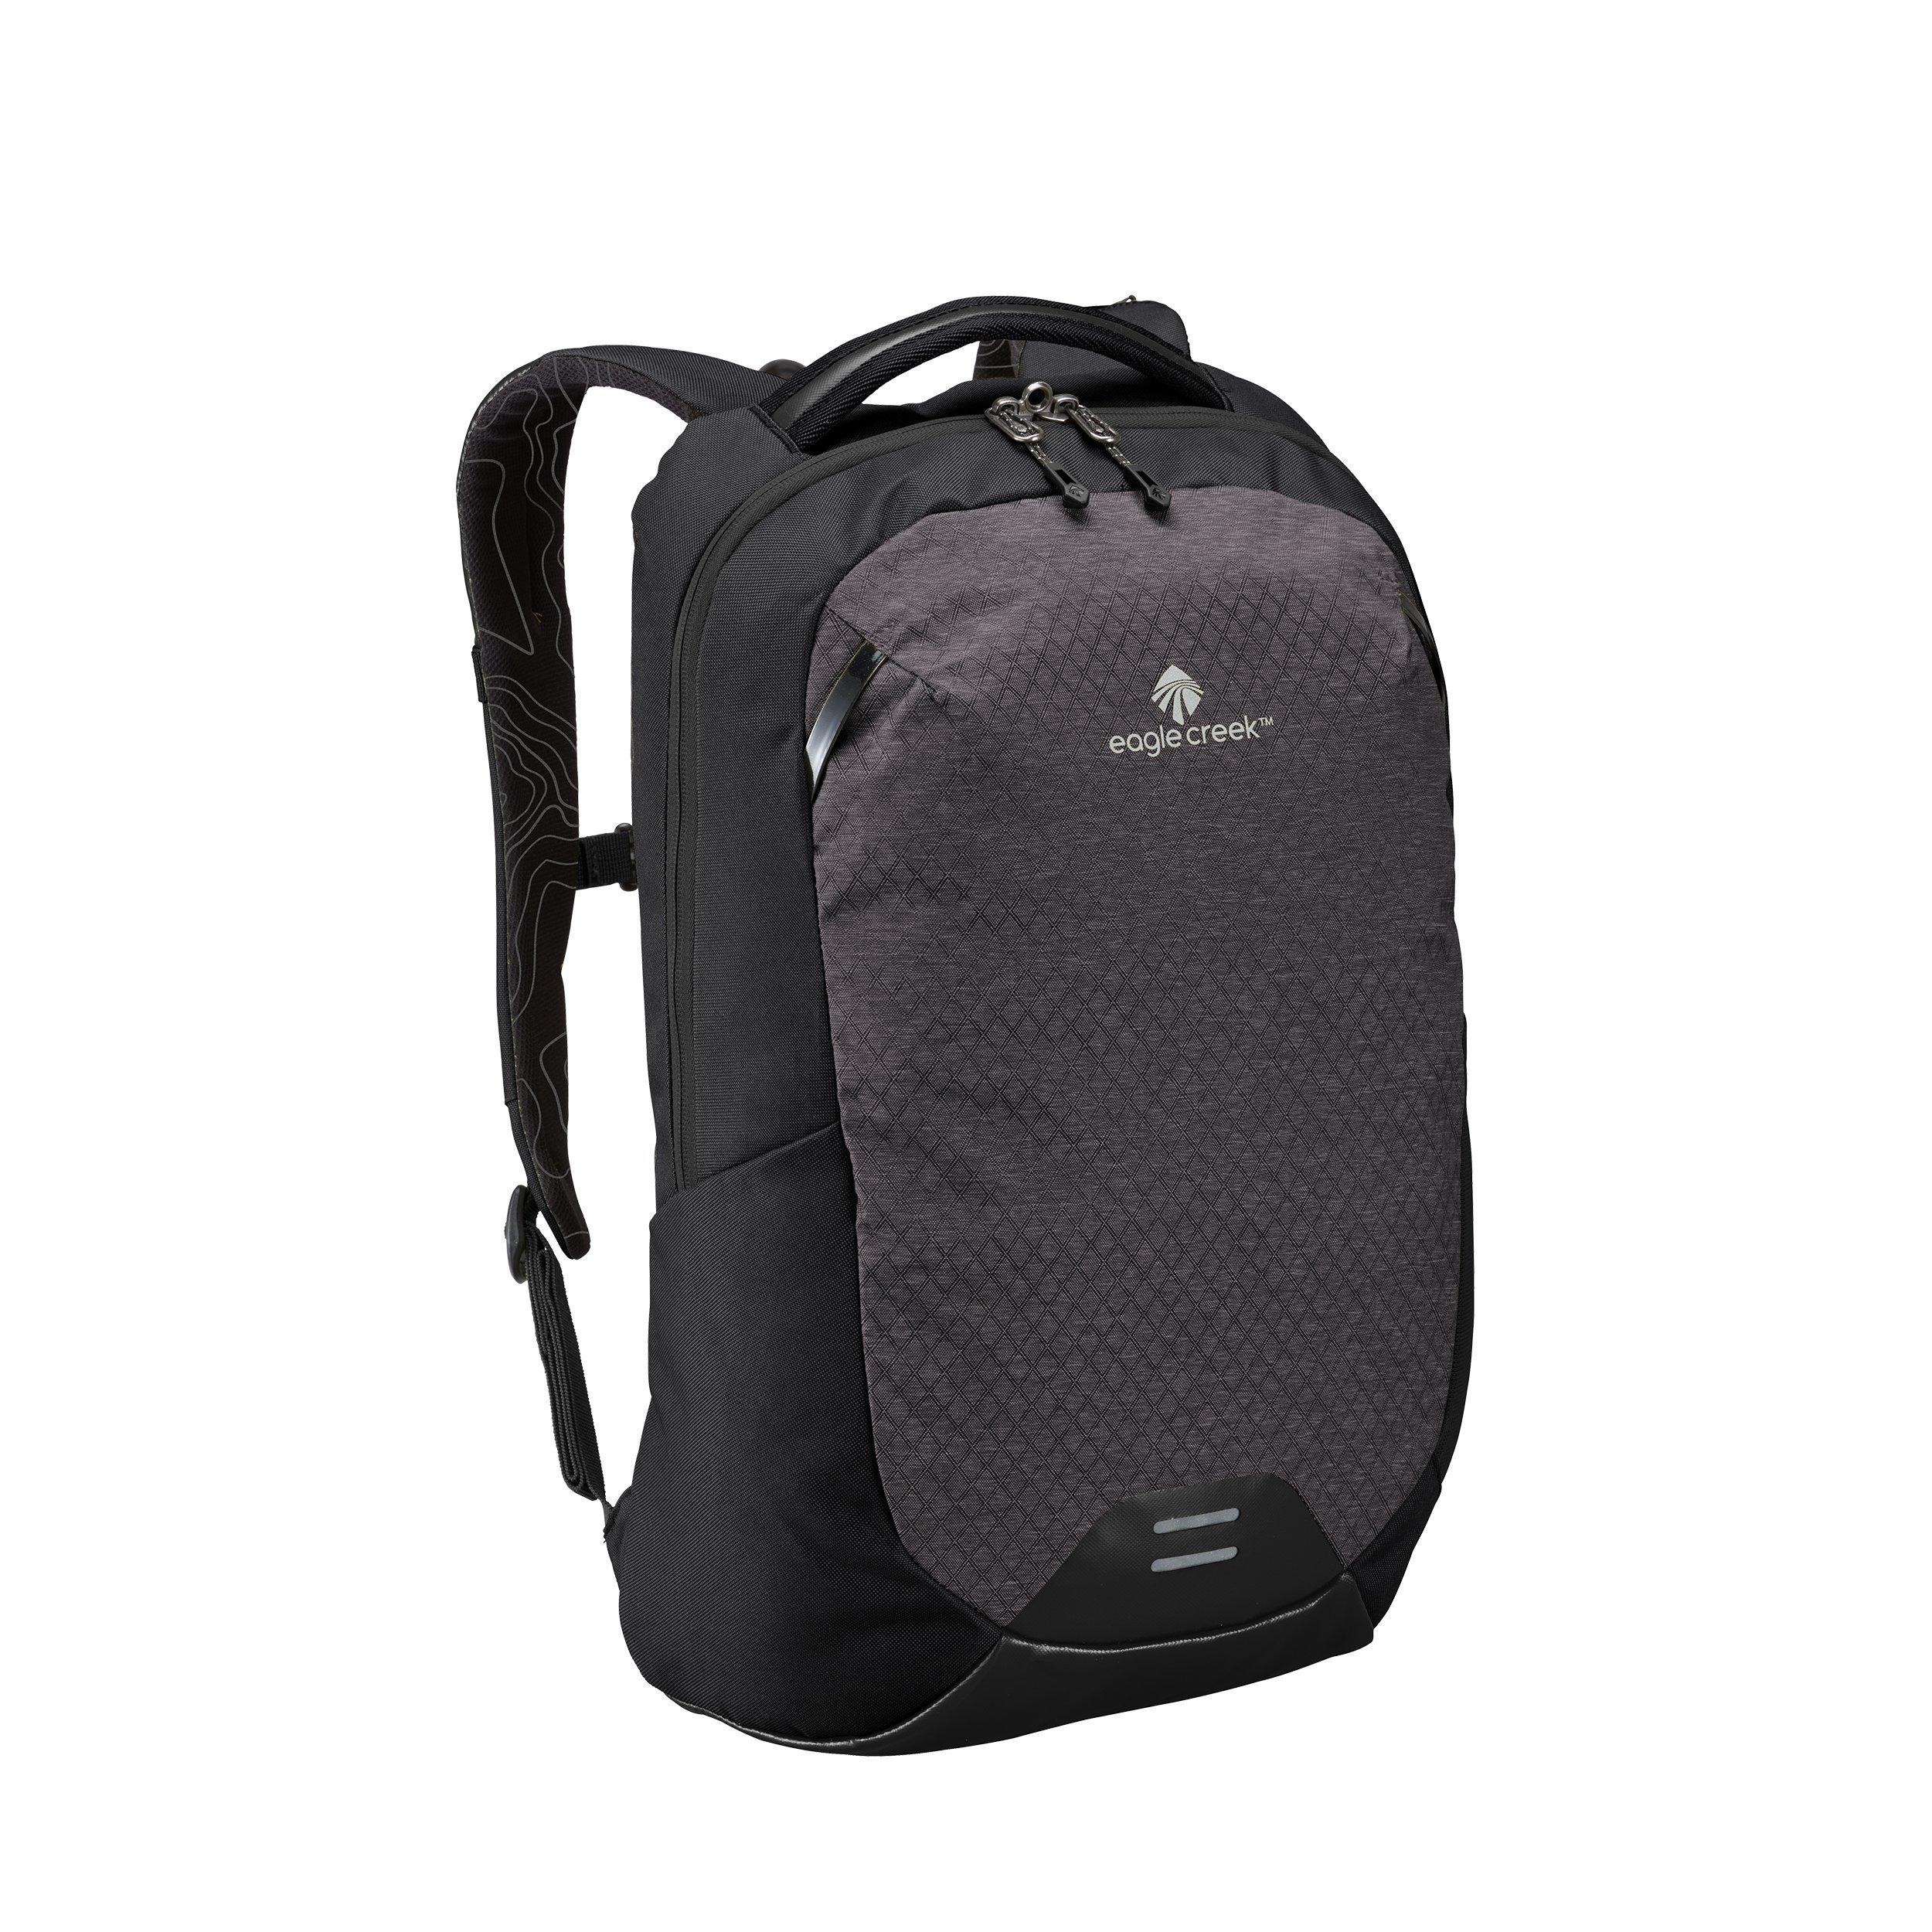 Eagle Creek Wayfinder 20L Backpack-multiuse-15in Laptop Hidden Tech Pocket Carry-On Luggage, Black/Charcoal